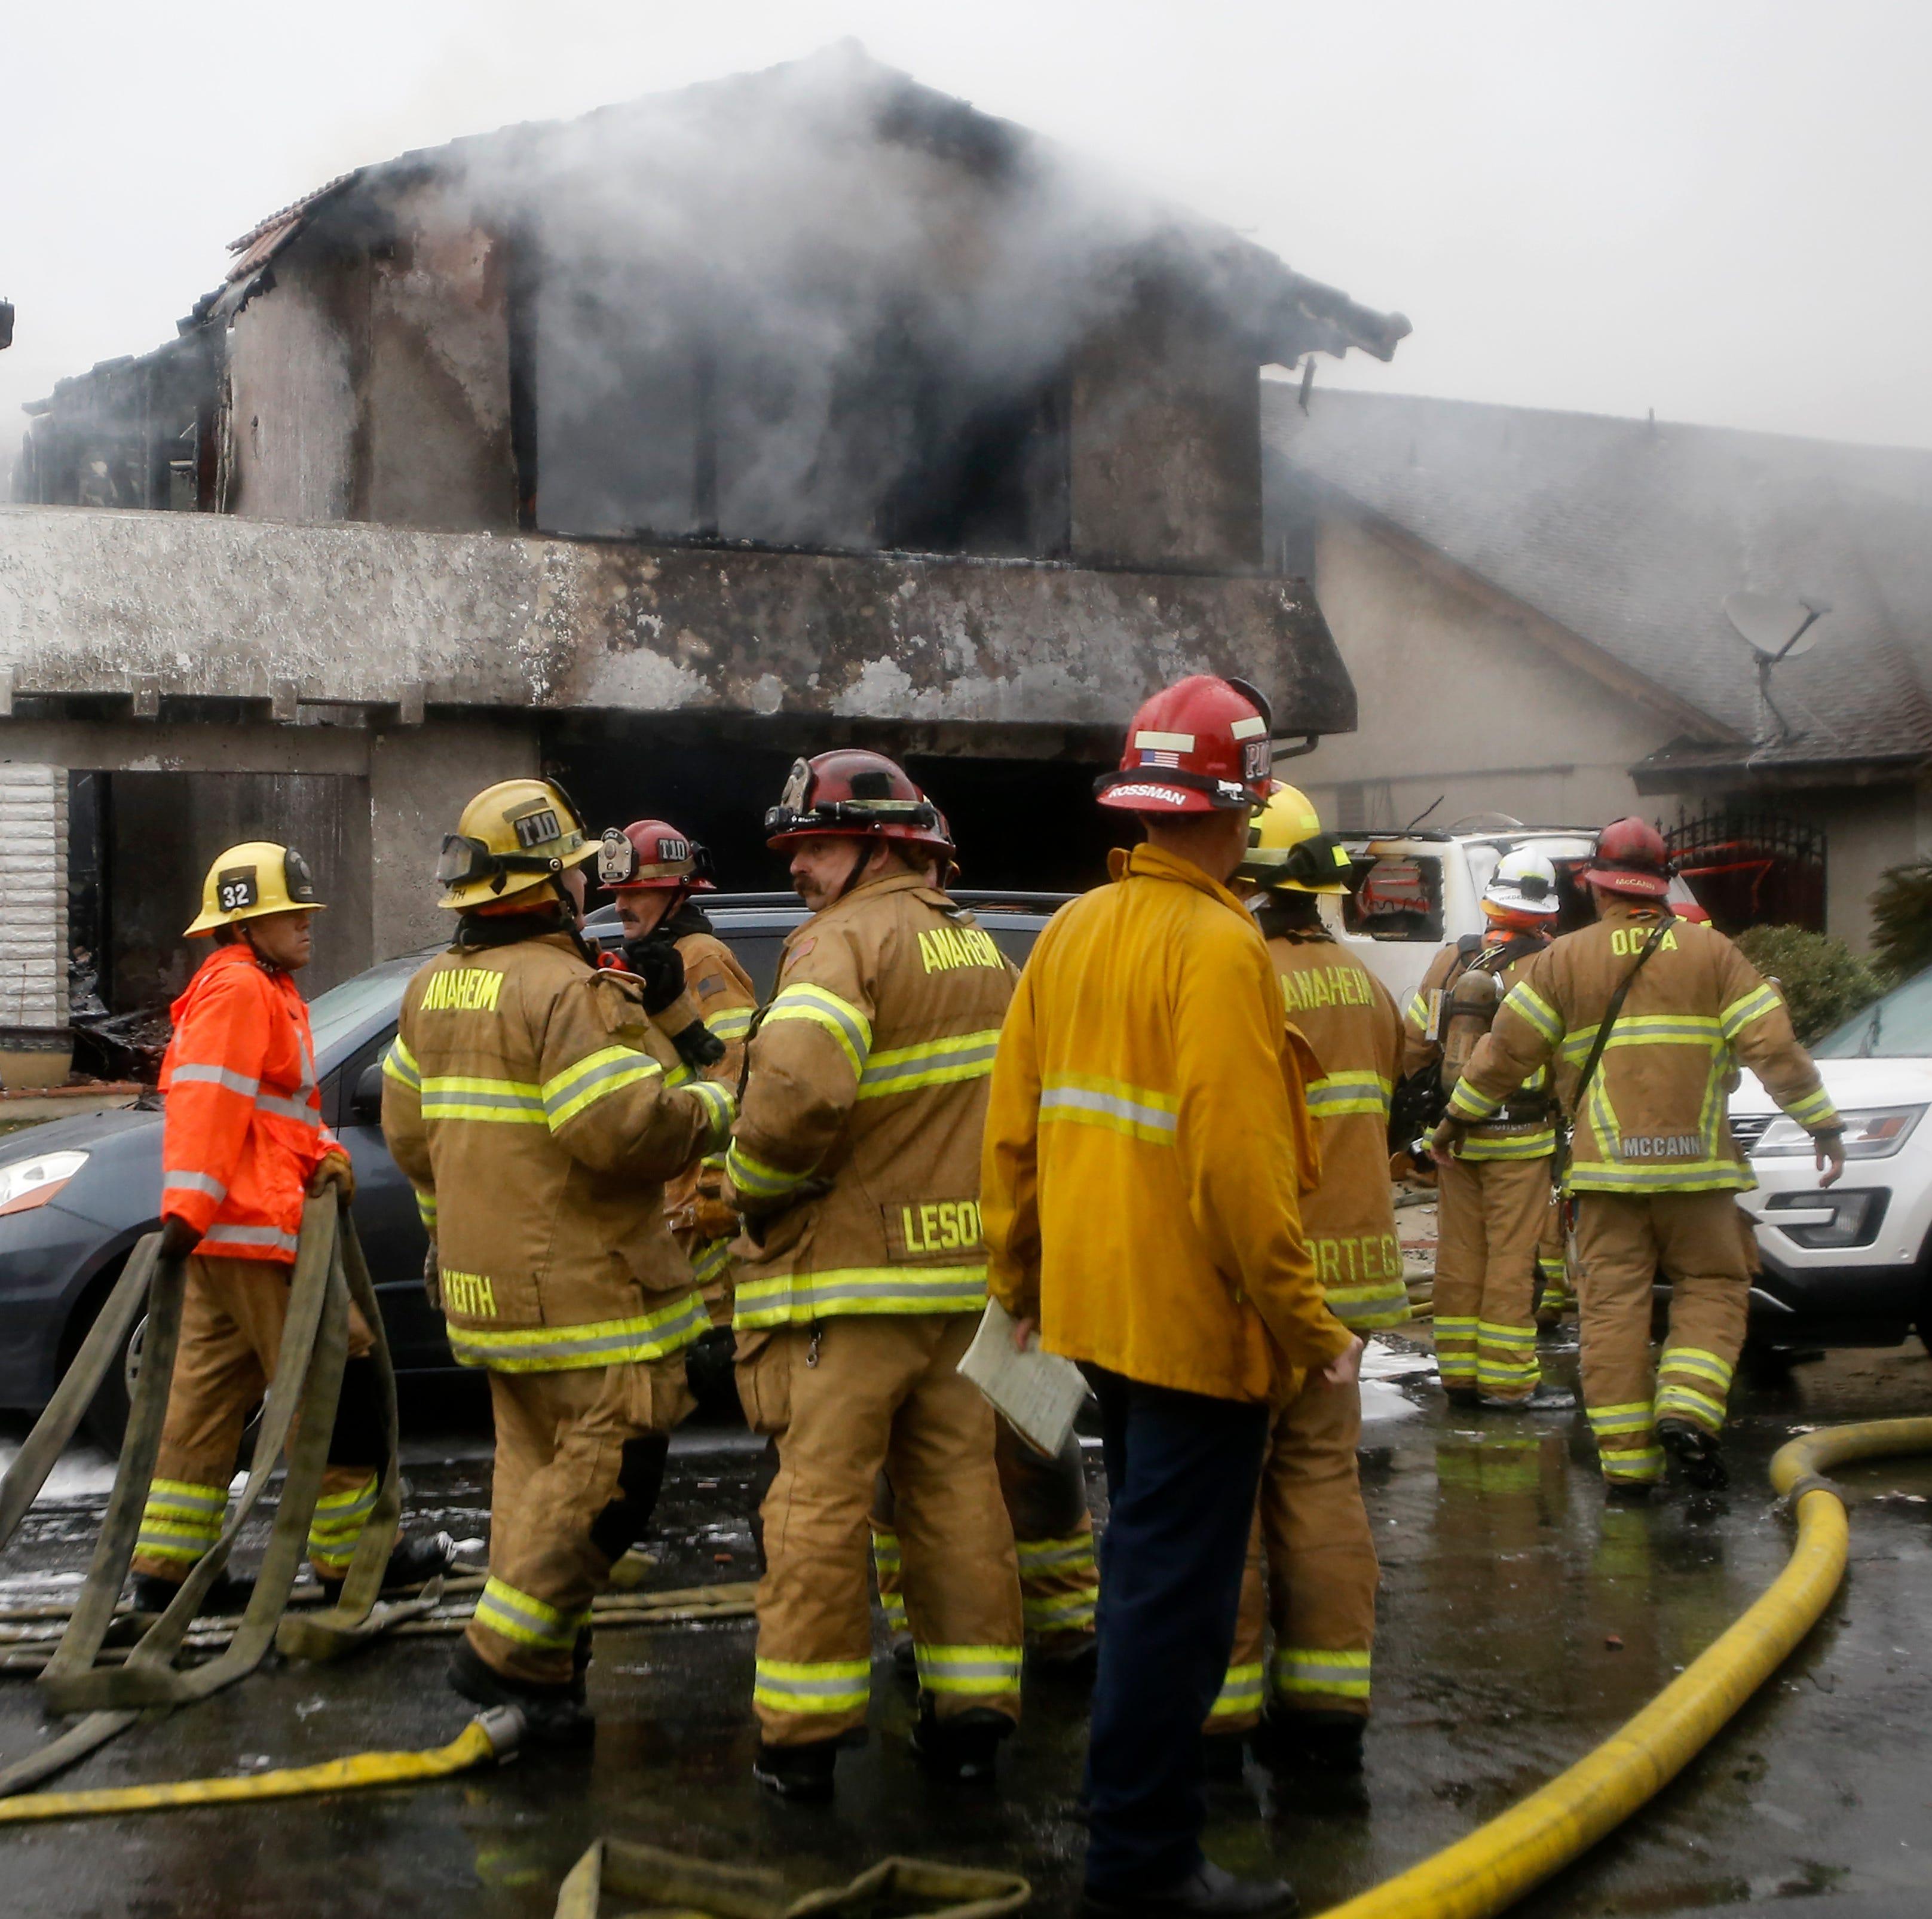 Gardnerville-based pilot in deadly California house crash had been disciplined